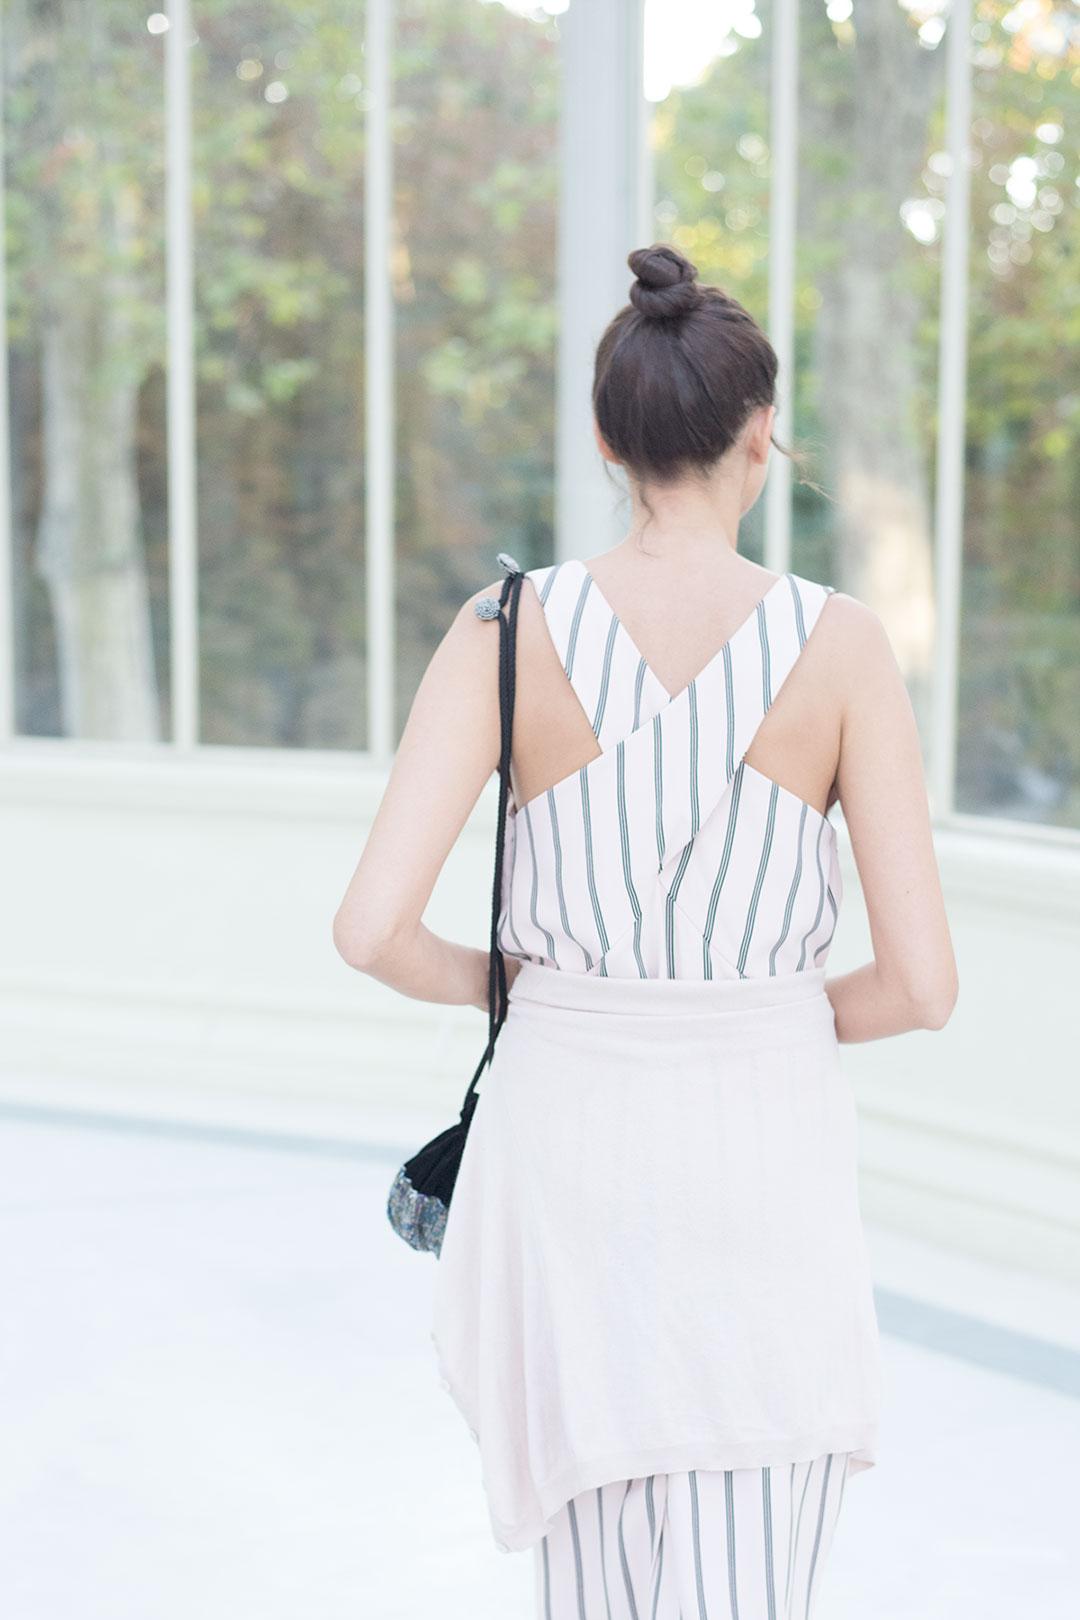 street-style-bailarinas-guerlain-mitmeblog-web-11